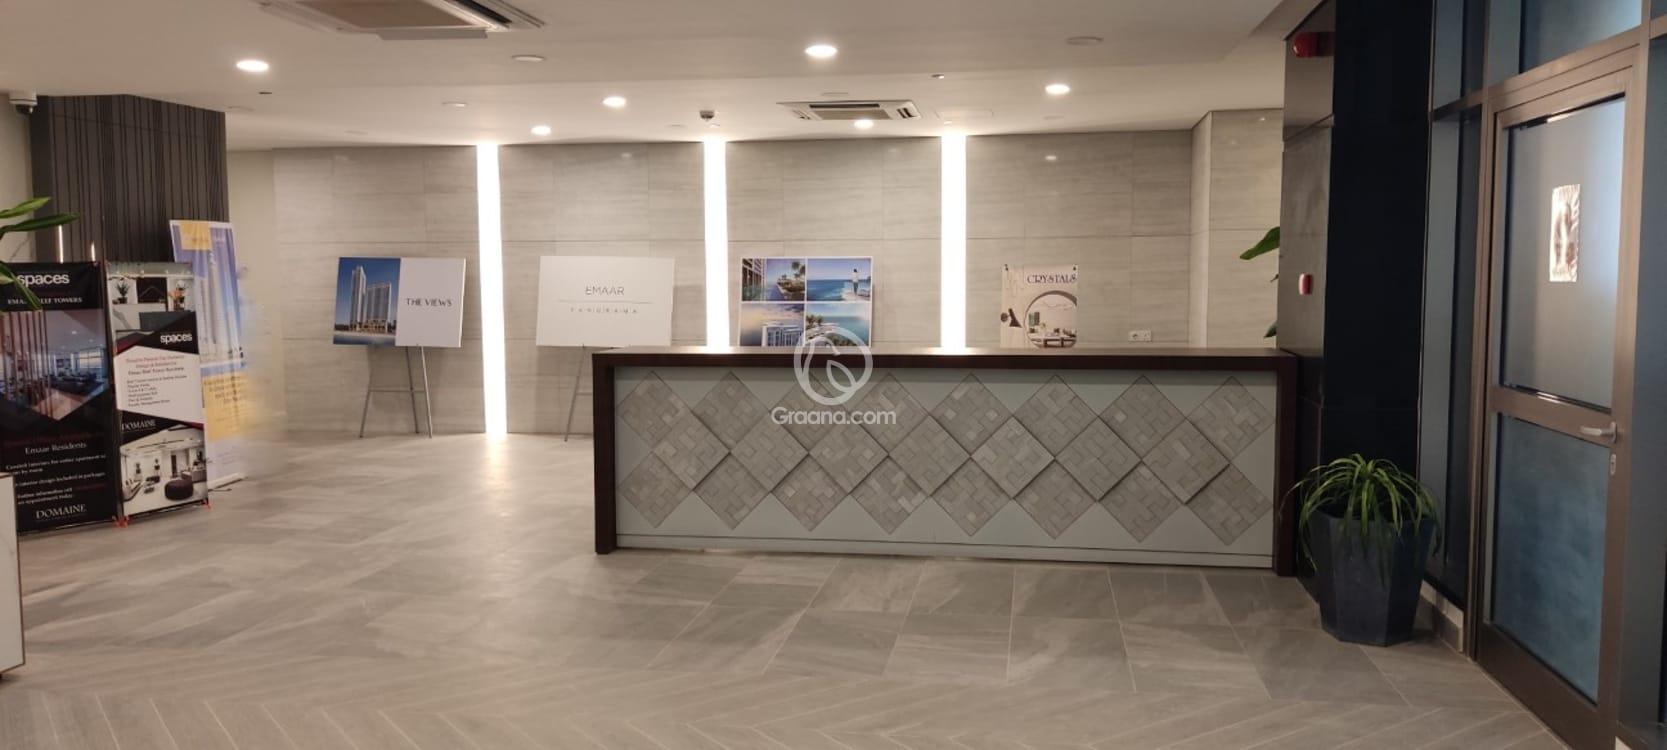 2550 Sqft Apartment for Sale    Graana.com